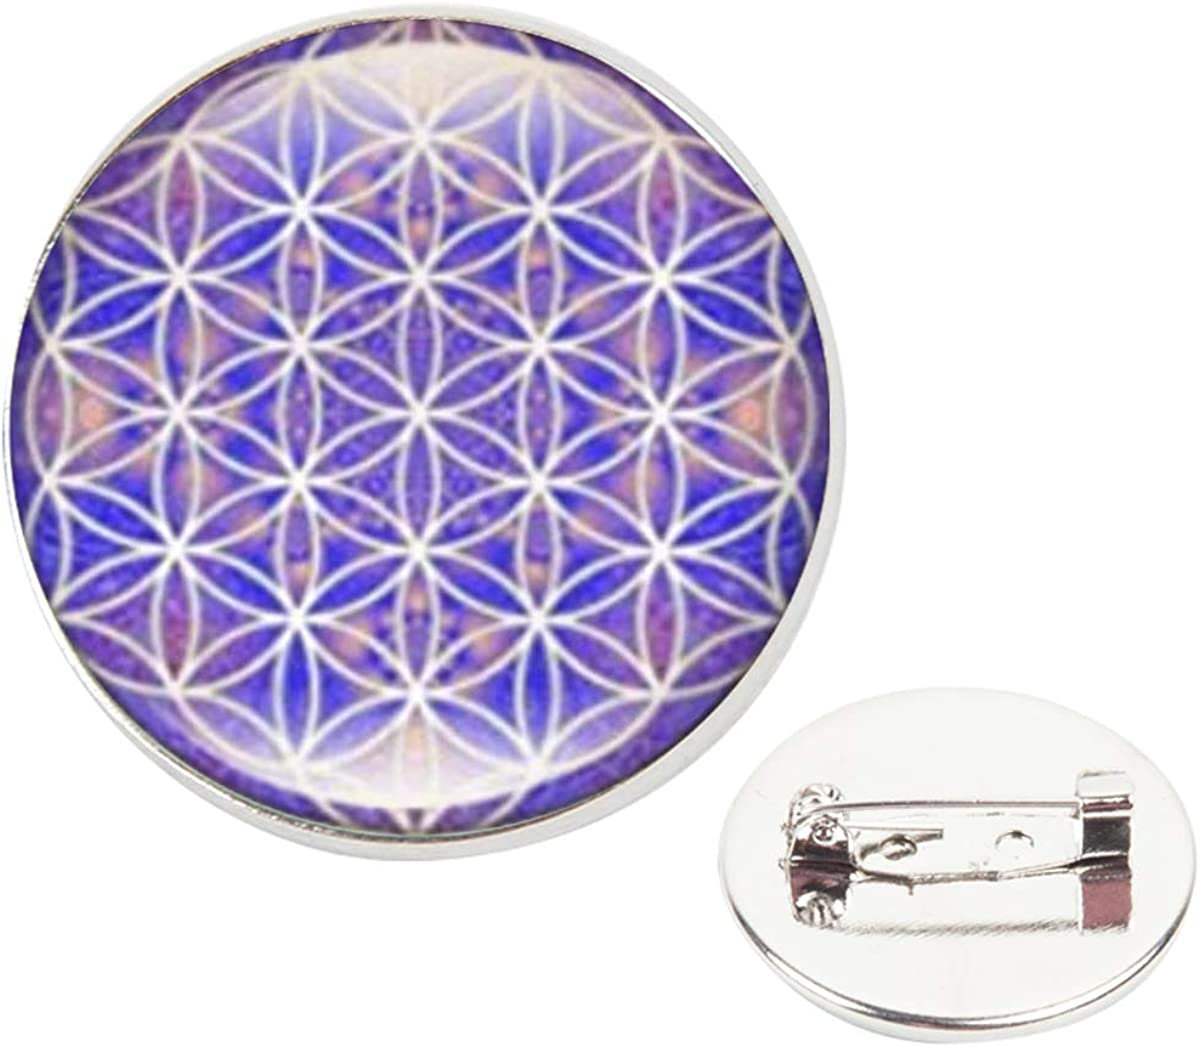 Pinback Buttons Badges Pins Geometric Purple Picture Mandala Flowers Lapel Pin Brooch Clip Trendy Accessory Jacket T-Shirt Bag Hat Shoe